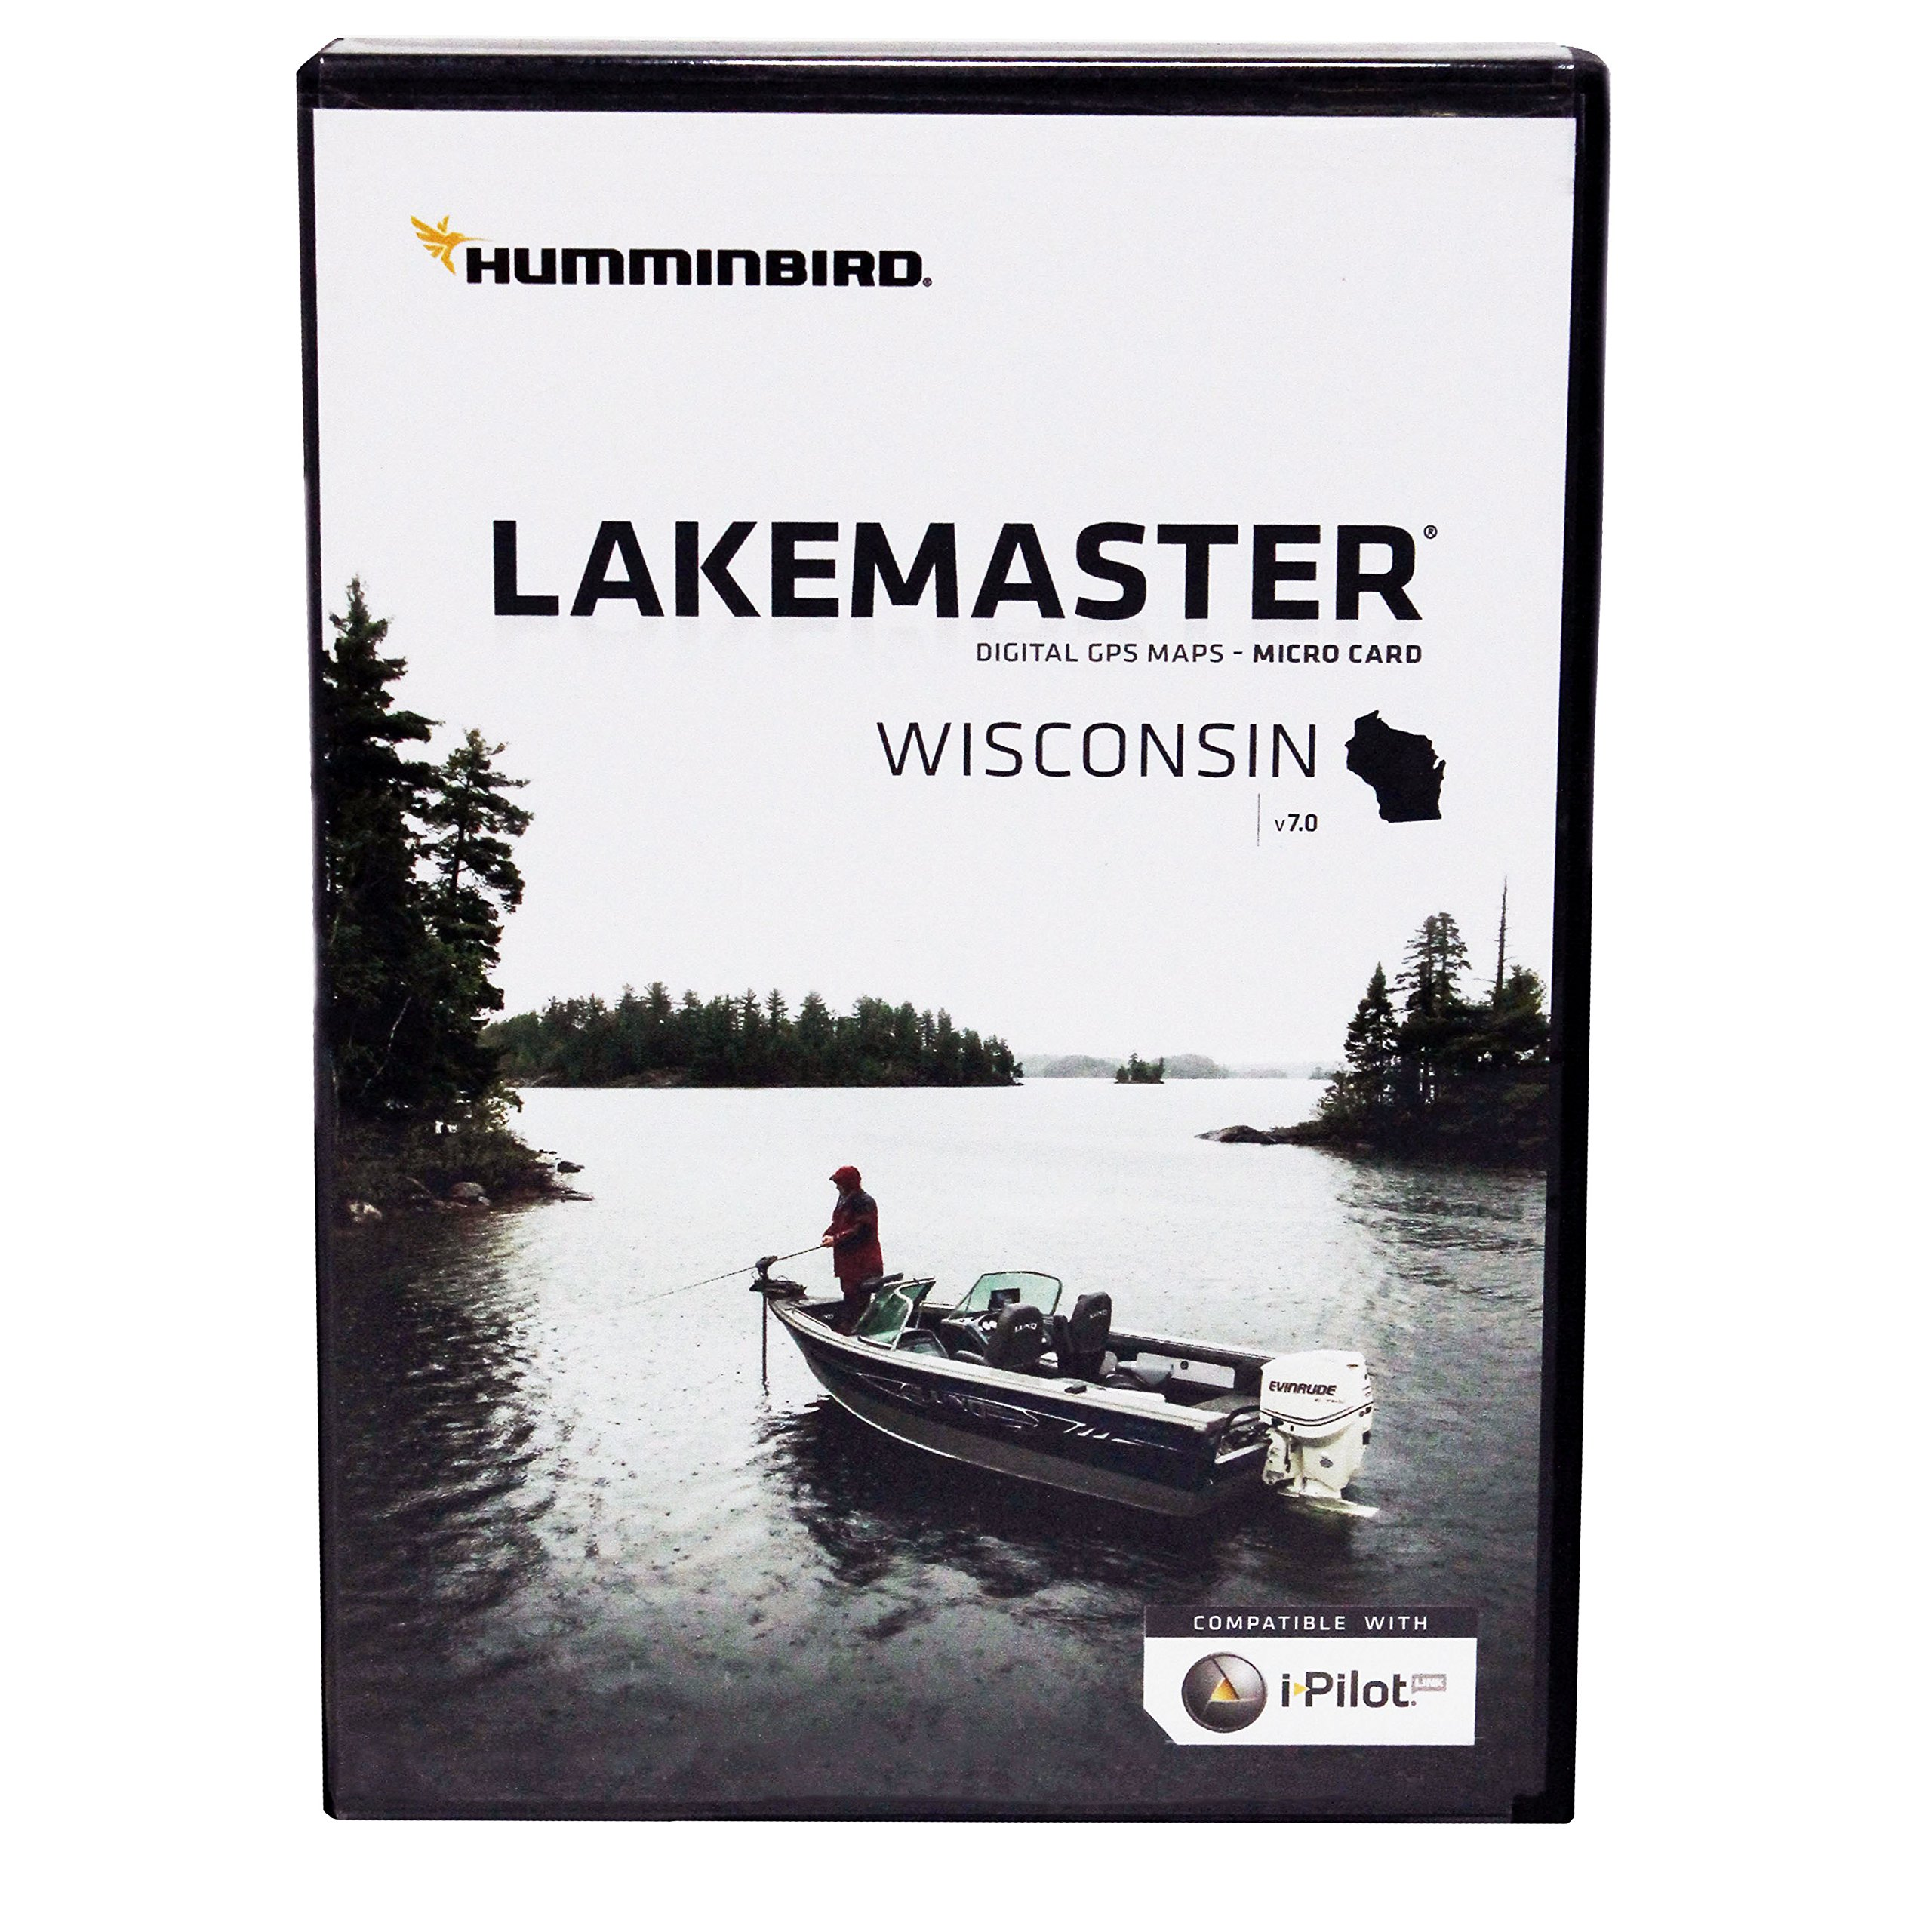 Humminbird LakeMaster Wisconsin Edition Digital GPS Lake Maps, Micro SD Card, Version 7 by Humminbird